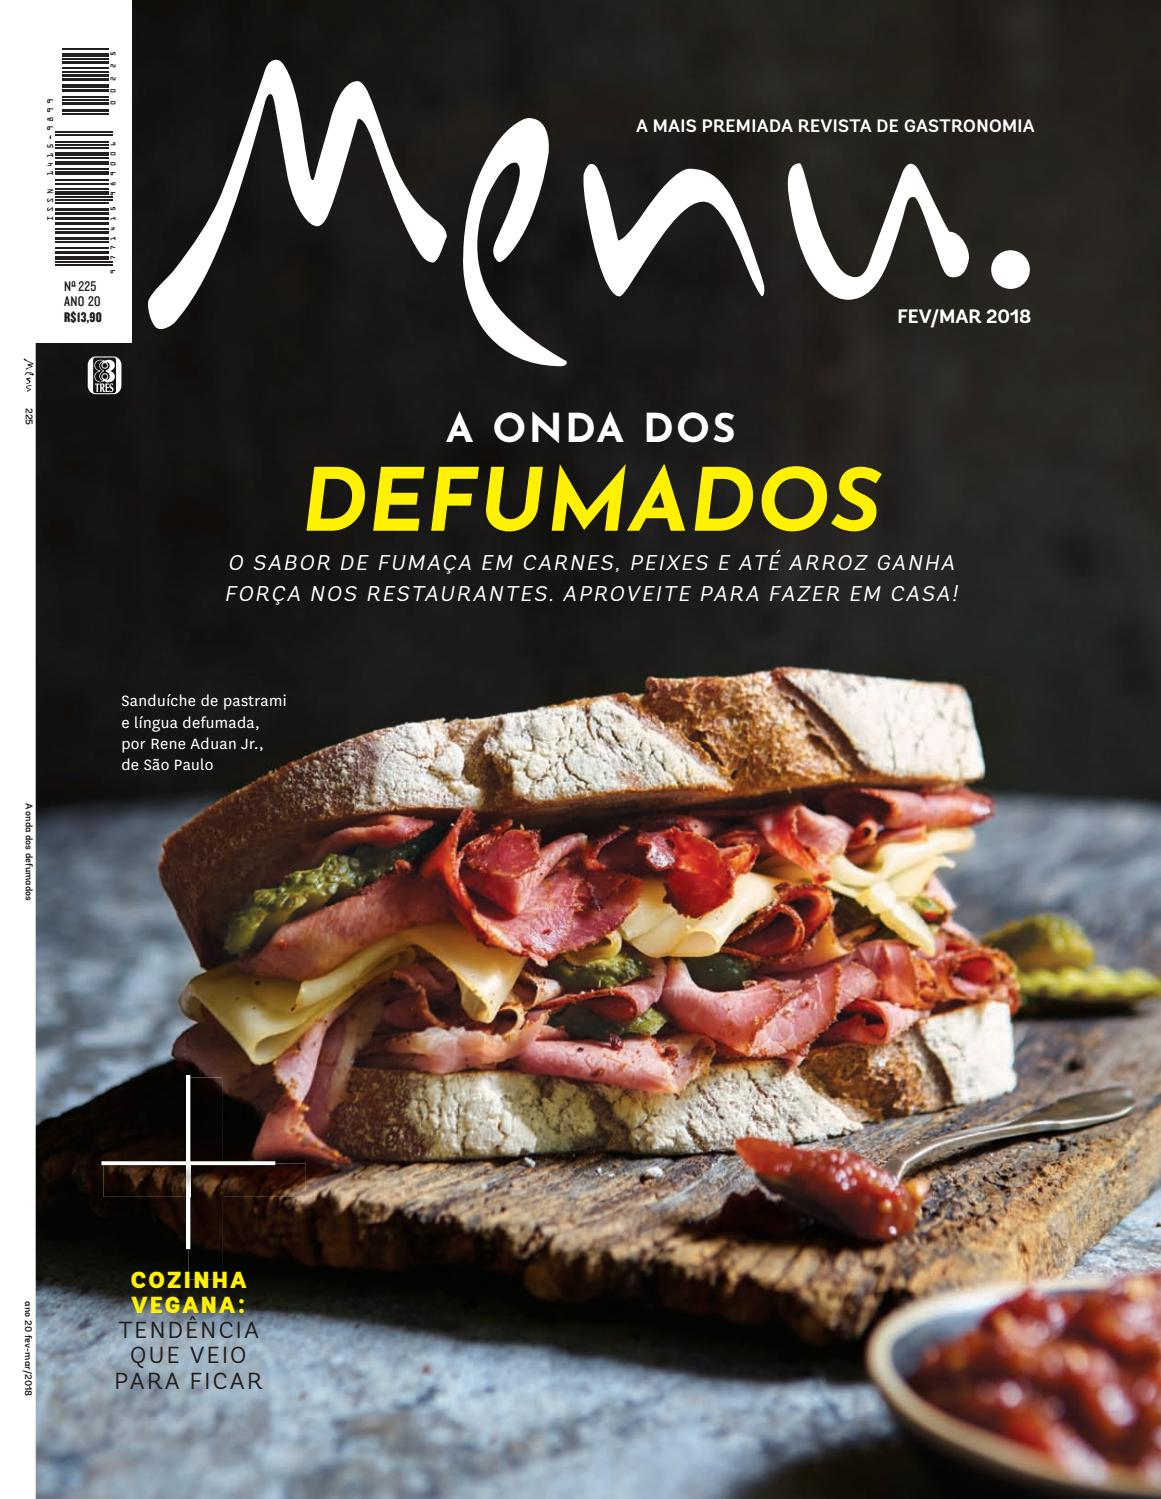 9d23d6e0d81 Menu 225 by Editora 3 - issuu